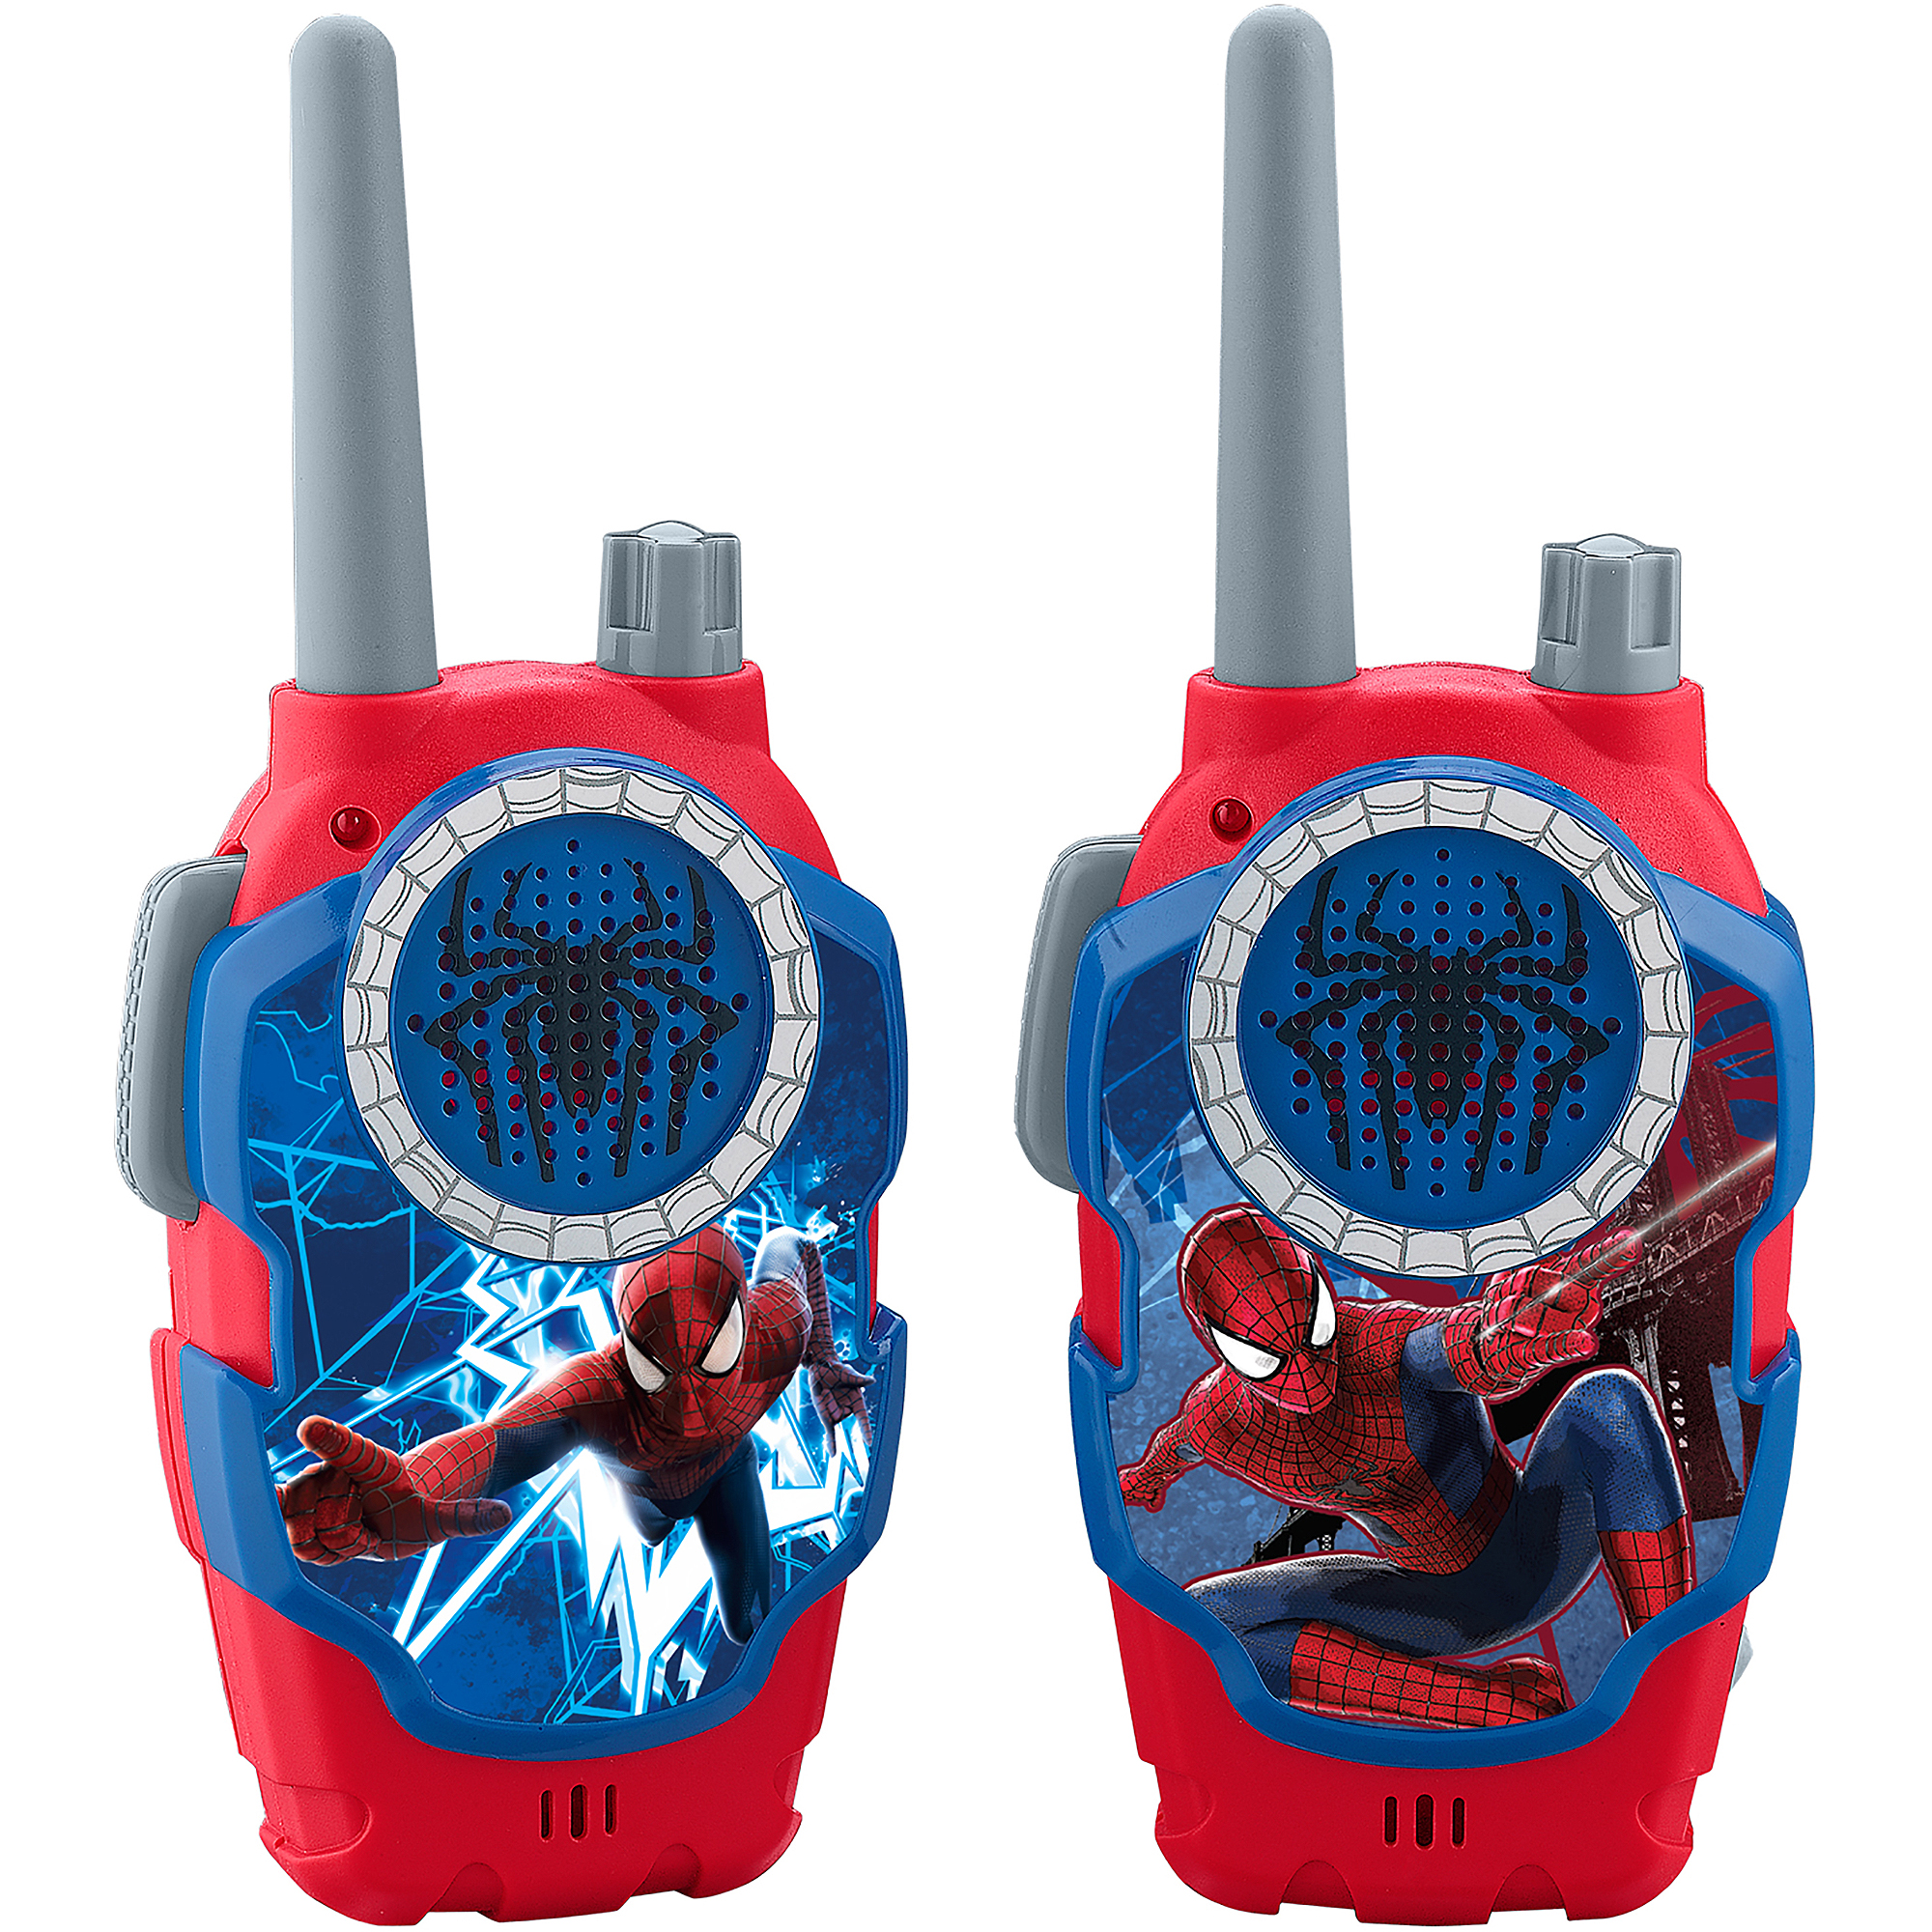 Amazing Spider-Man FRS 2-Way Radios by Generic